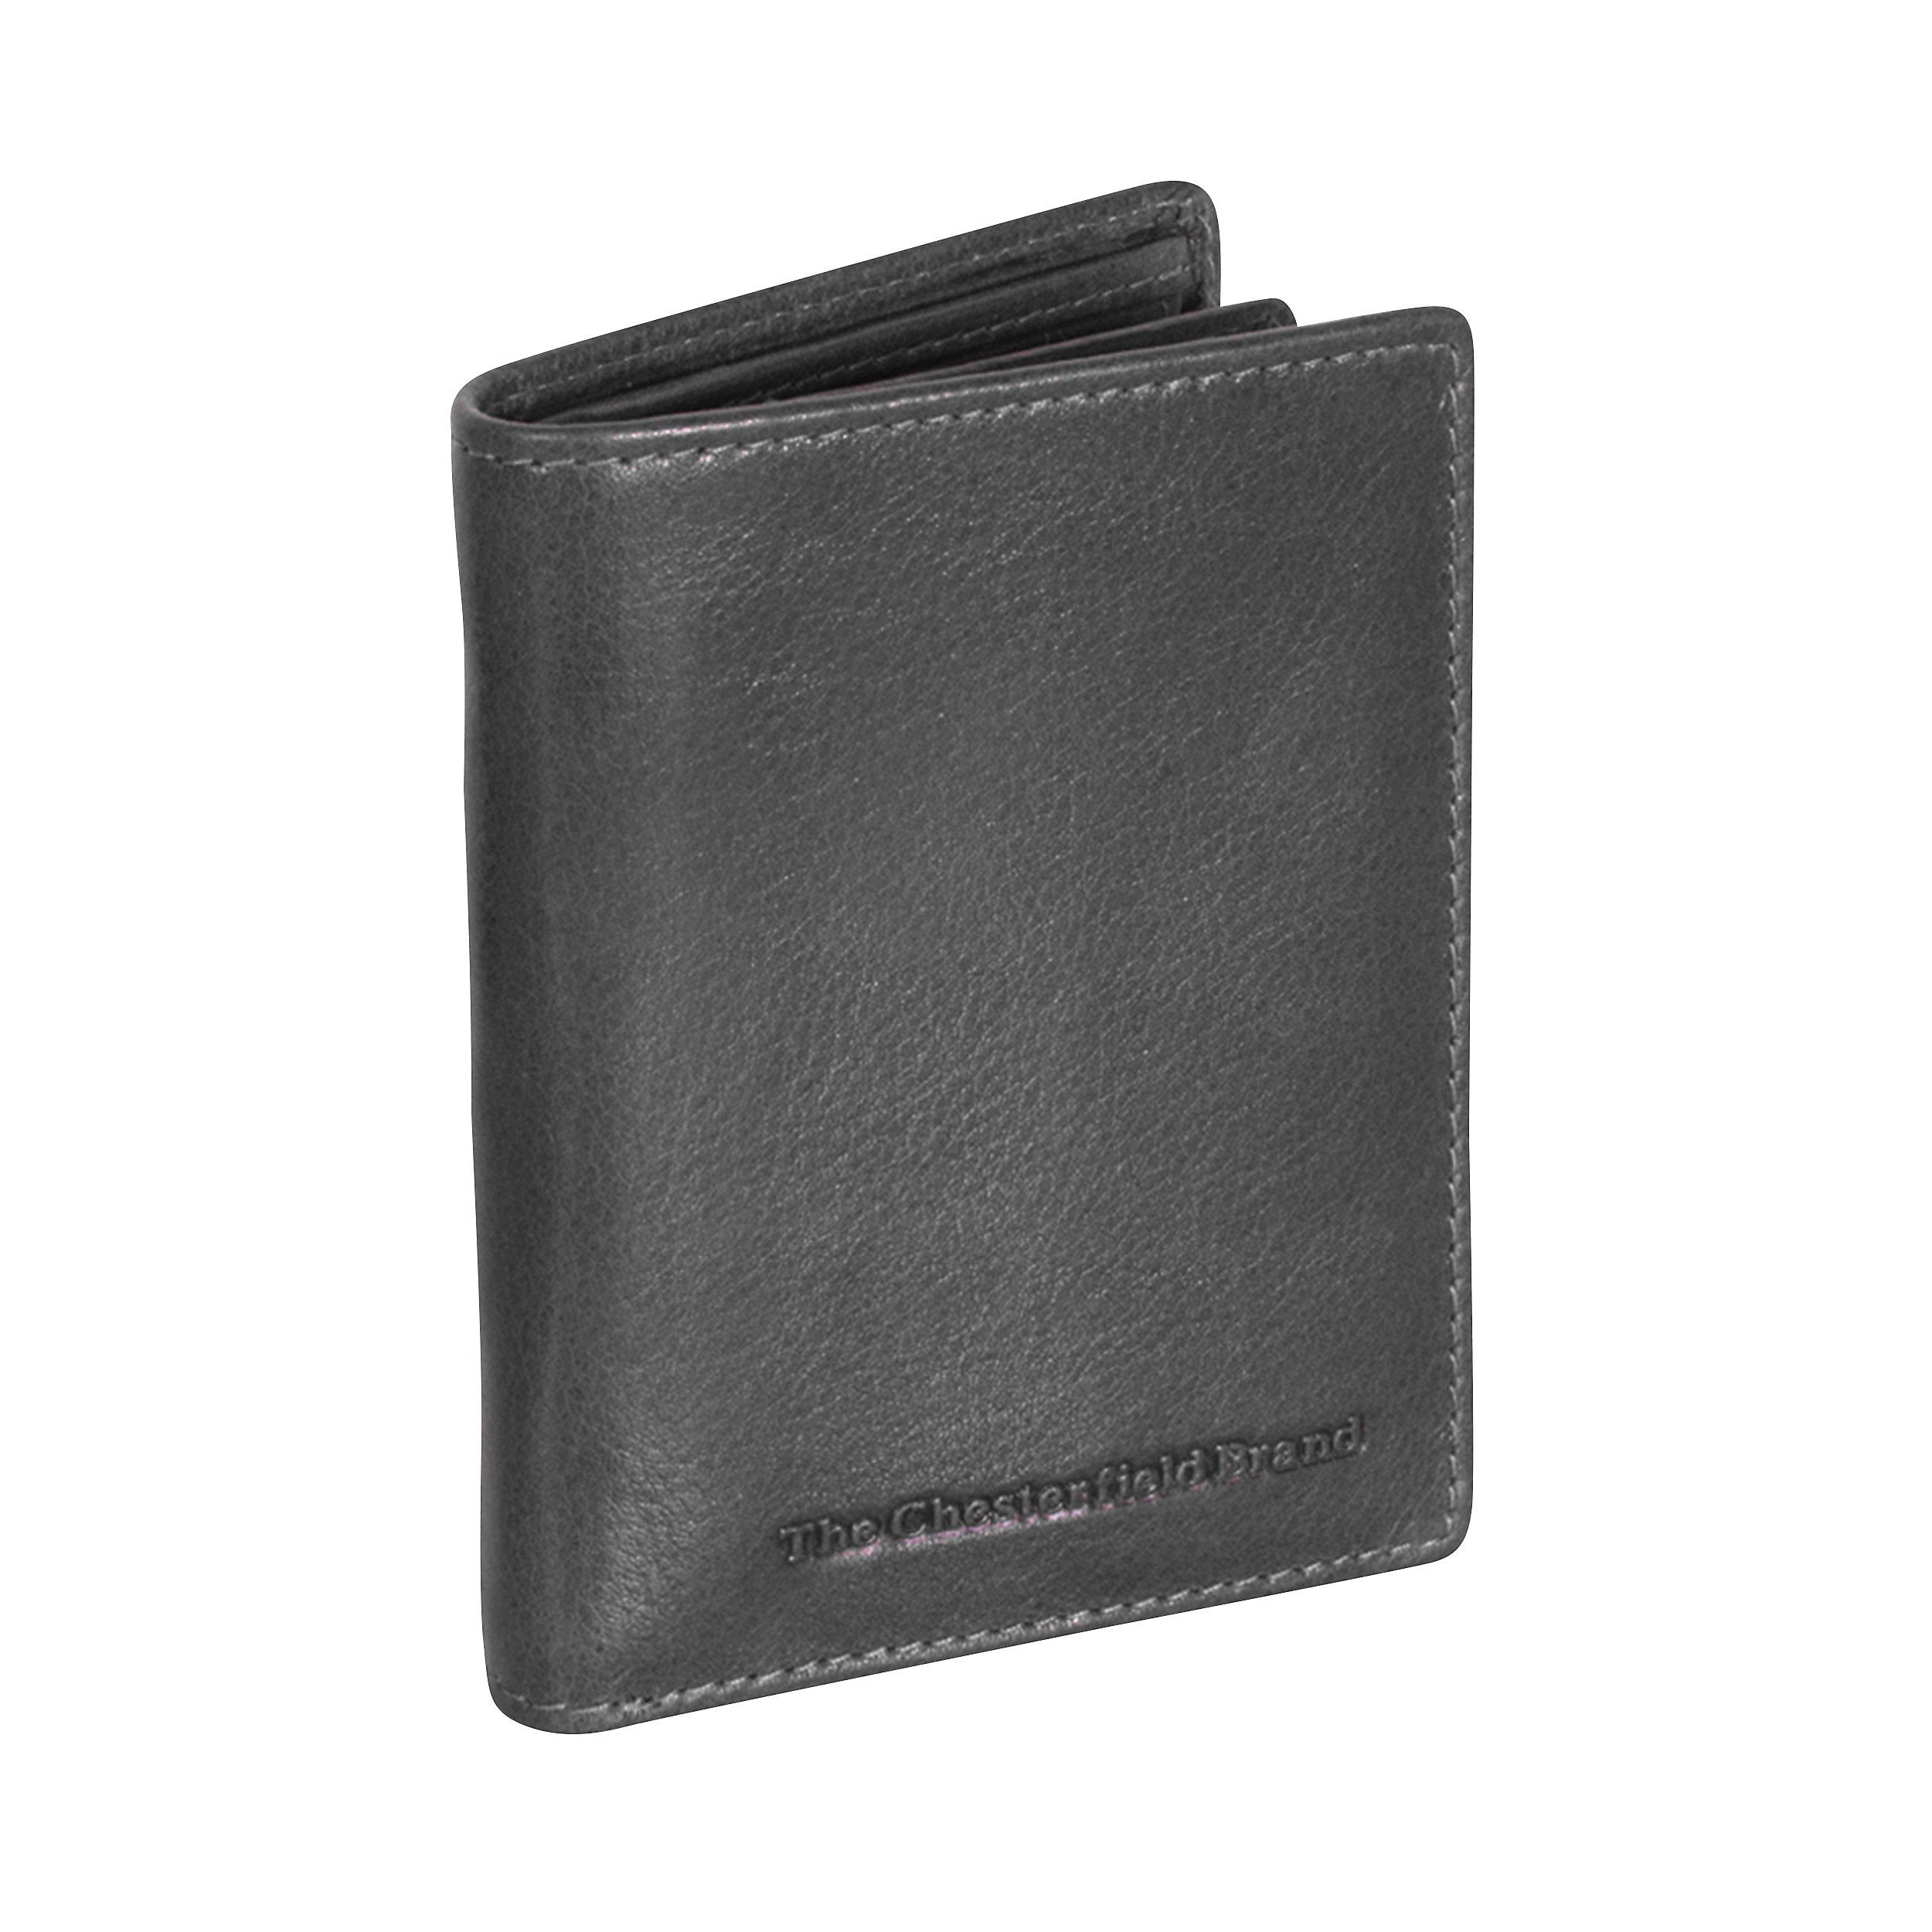 Kombibörse Mason hoch 5KK RFID Odean Leather Collection M